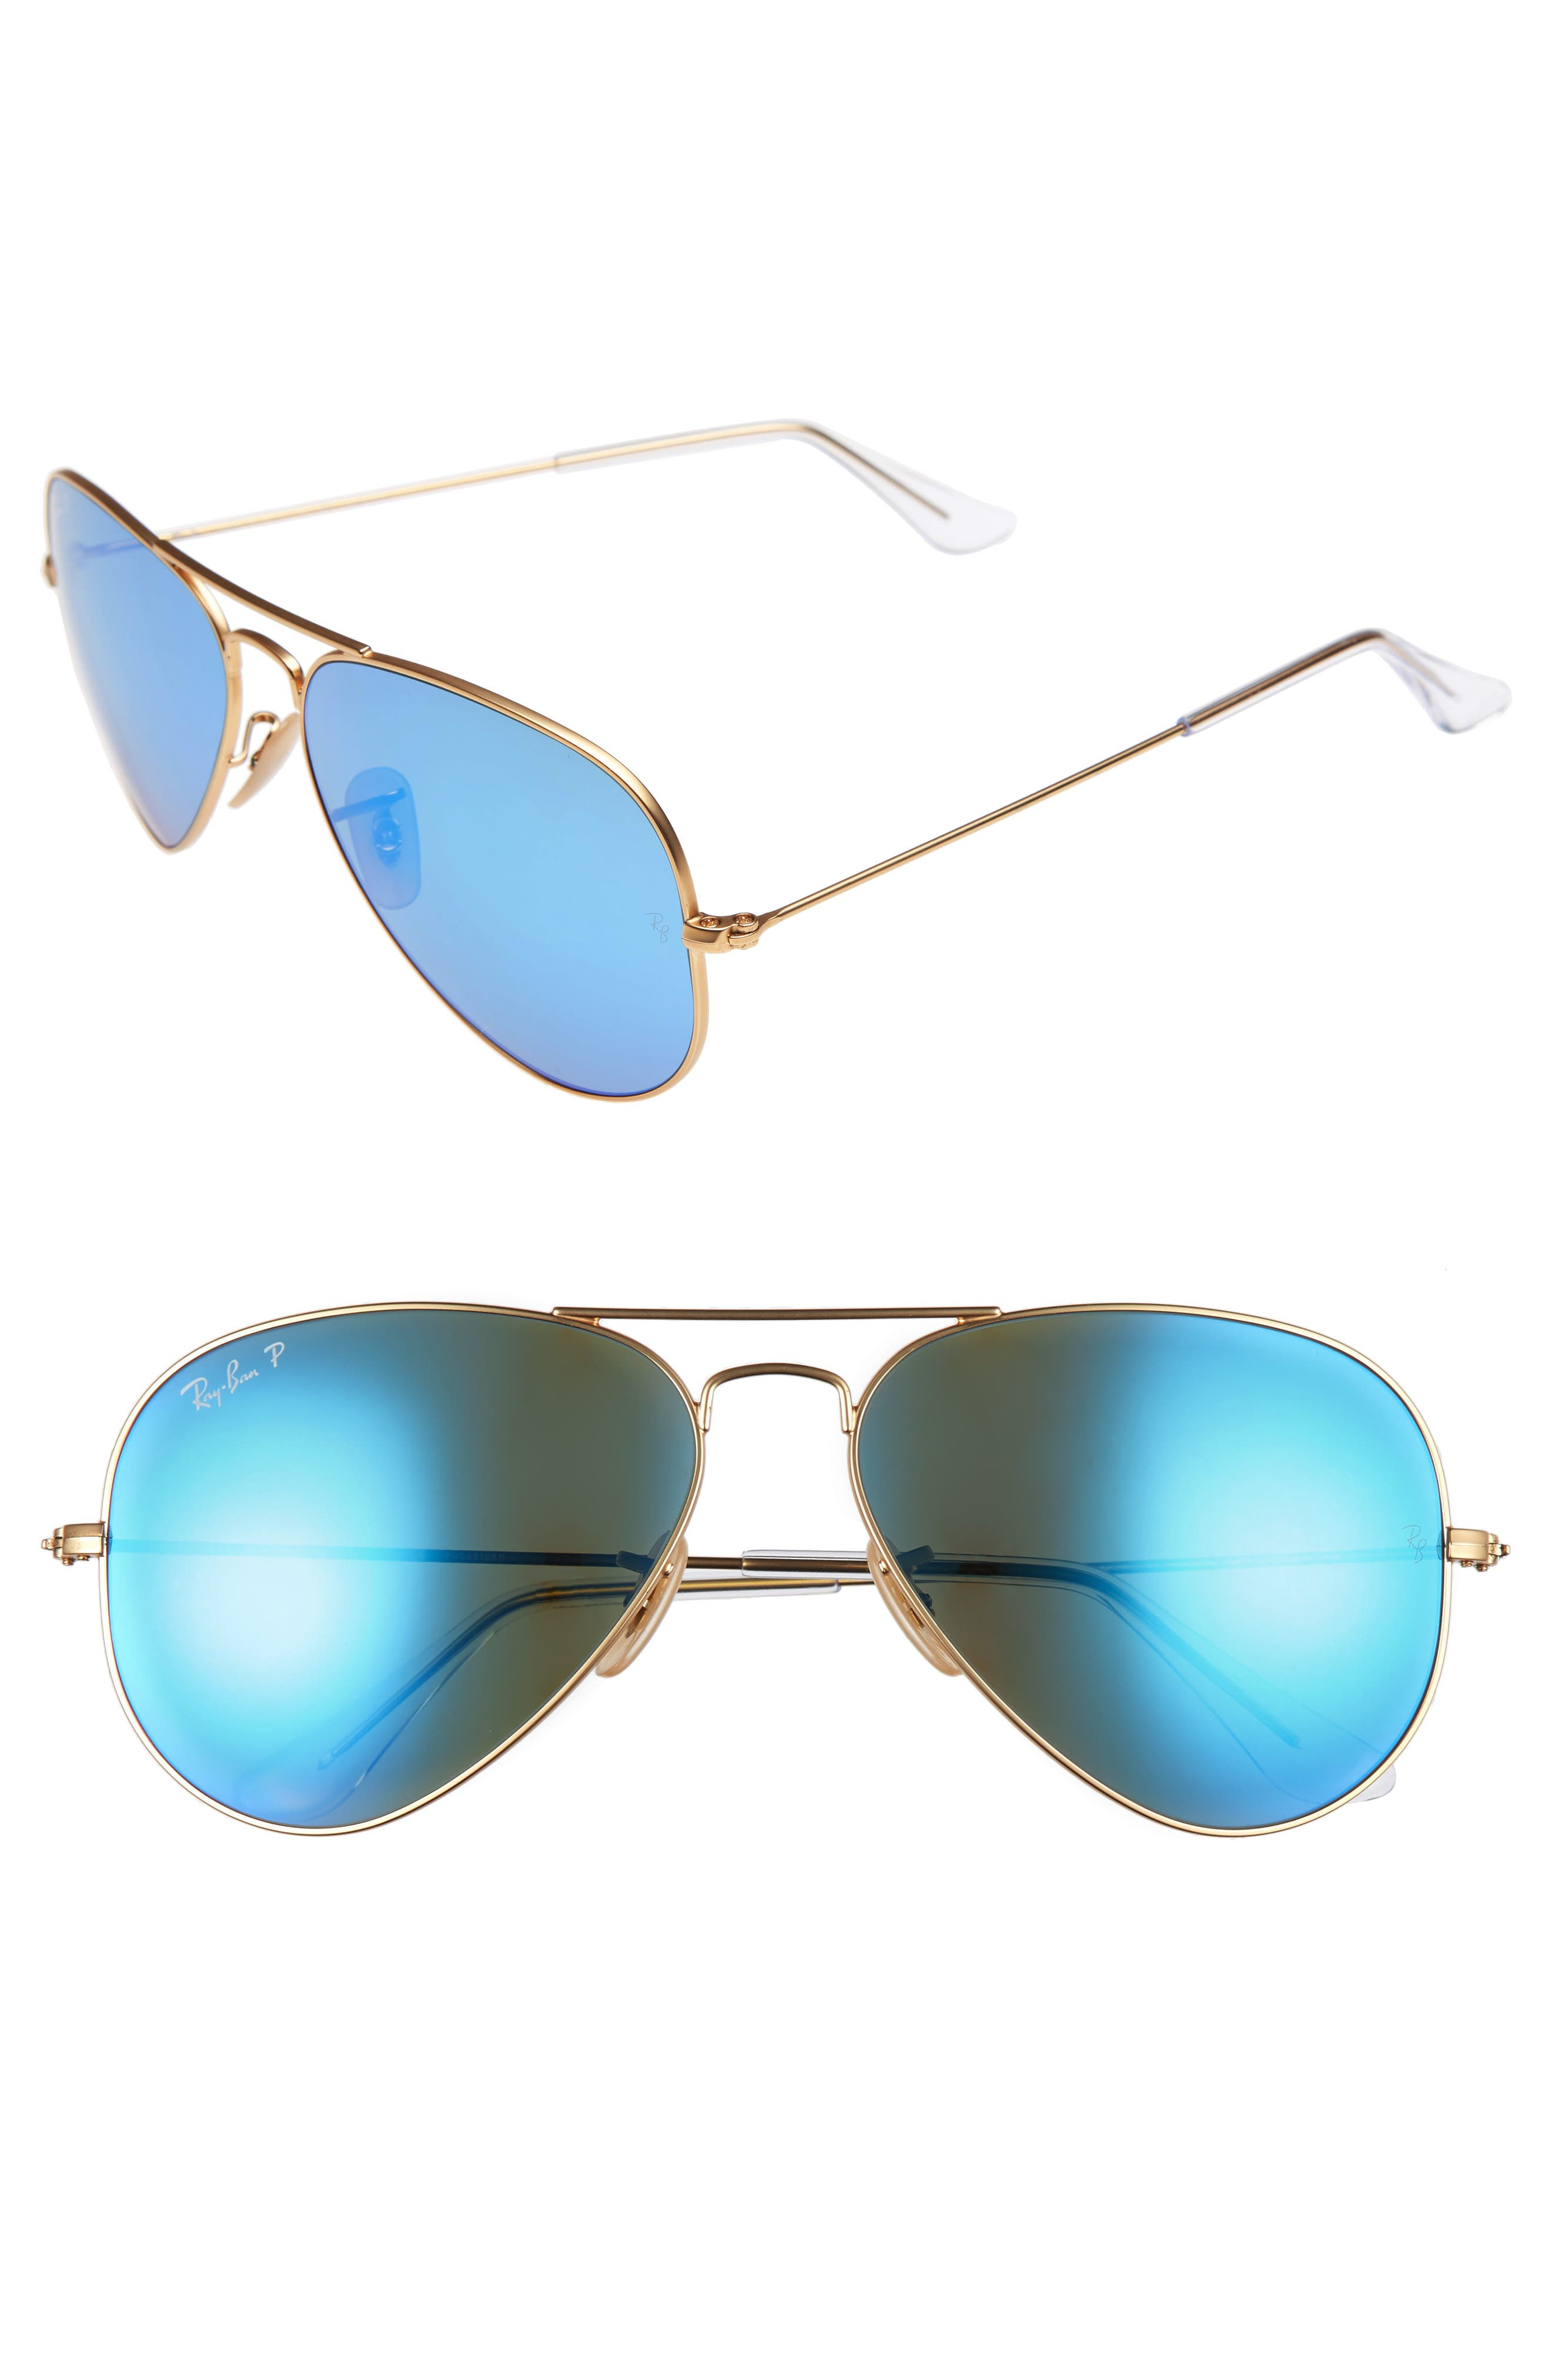 58mm Polarized Aviator Sunglasses,                             Main thumbnail 1, color,                             MATTE GOLD/ BLUE MIRROR